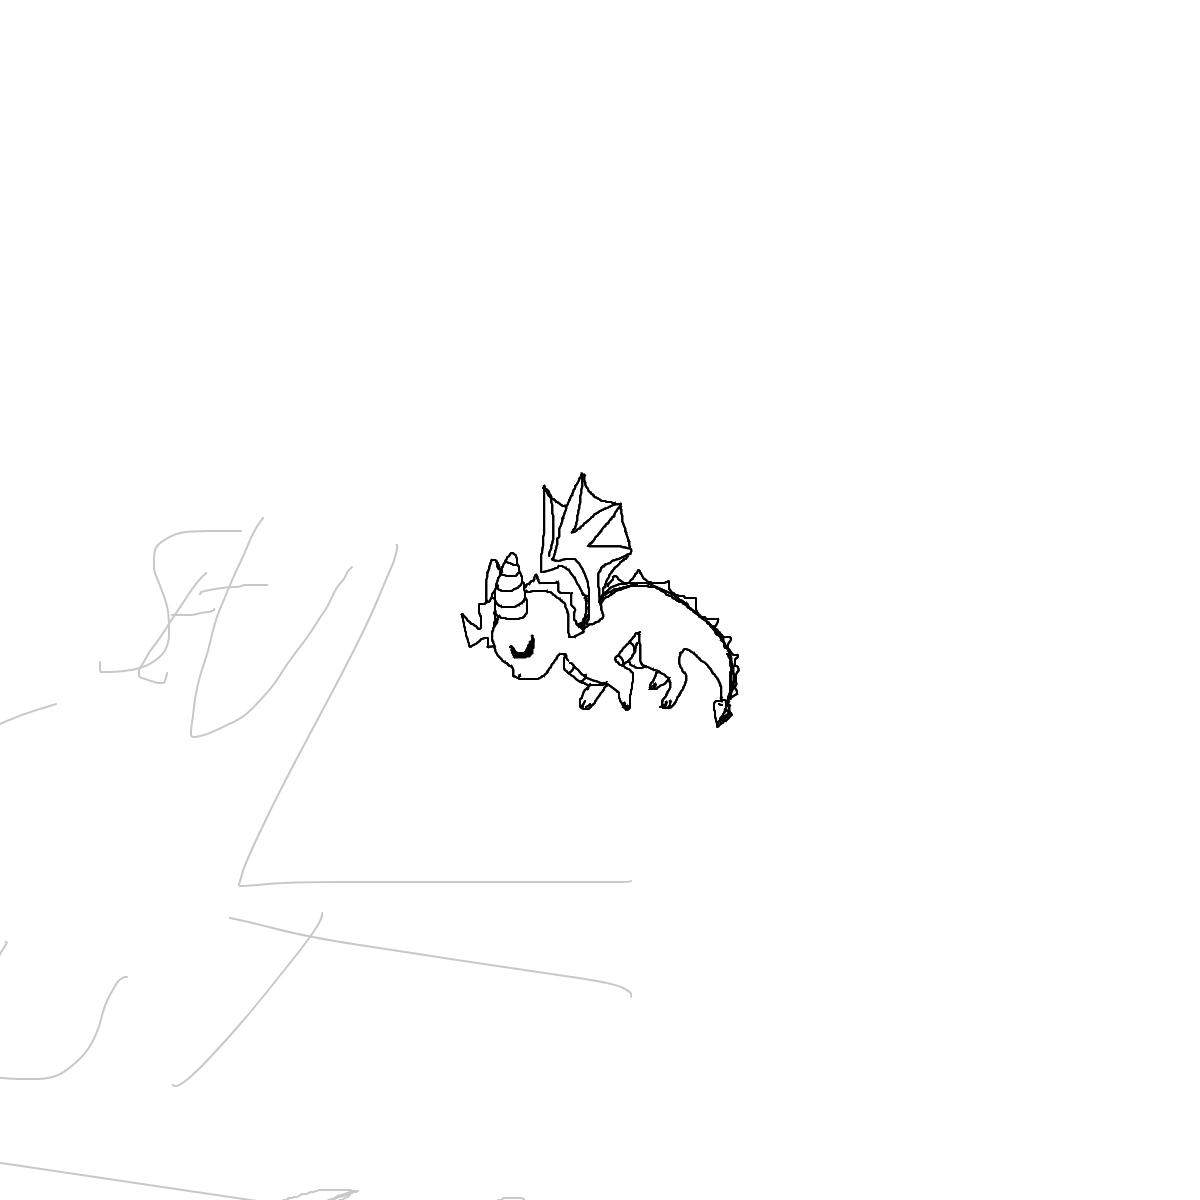 BAAAM drawing#23631 lat:43.4504394531250000lng: 4.9393239021301270